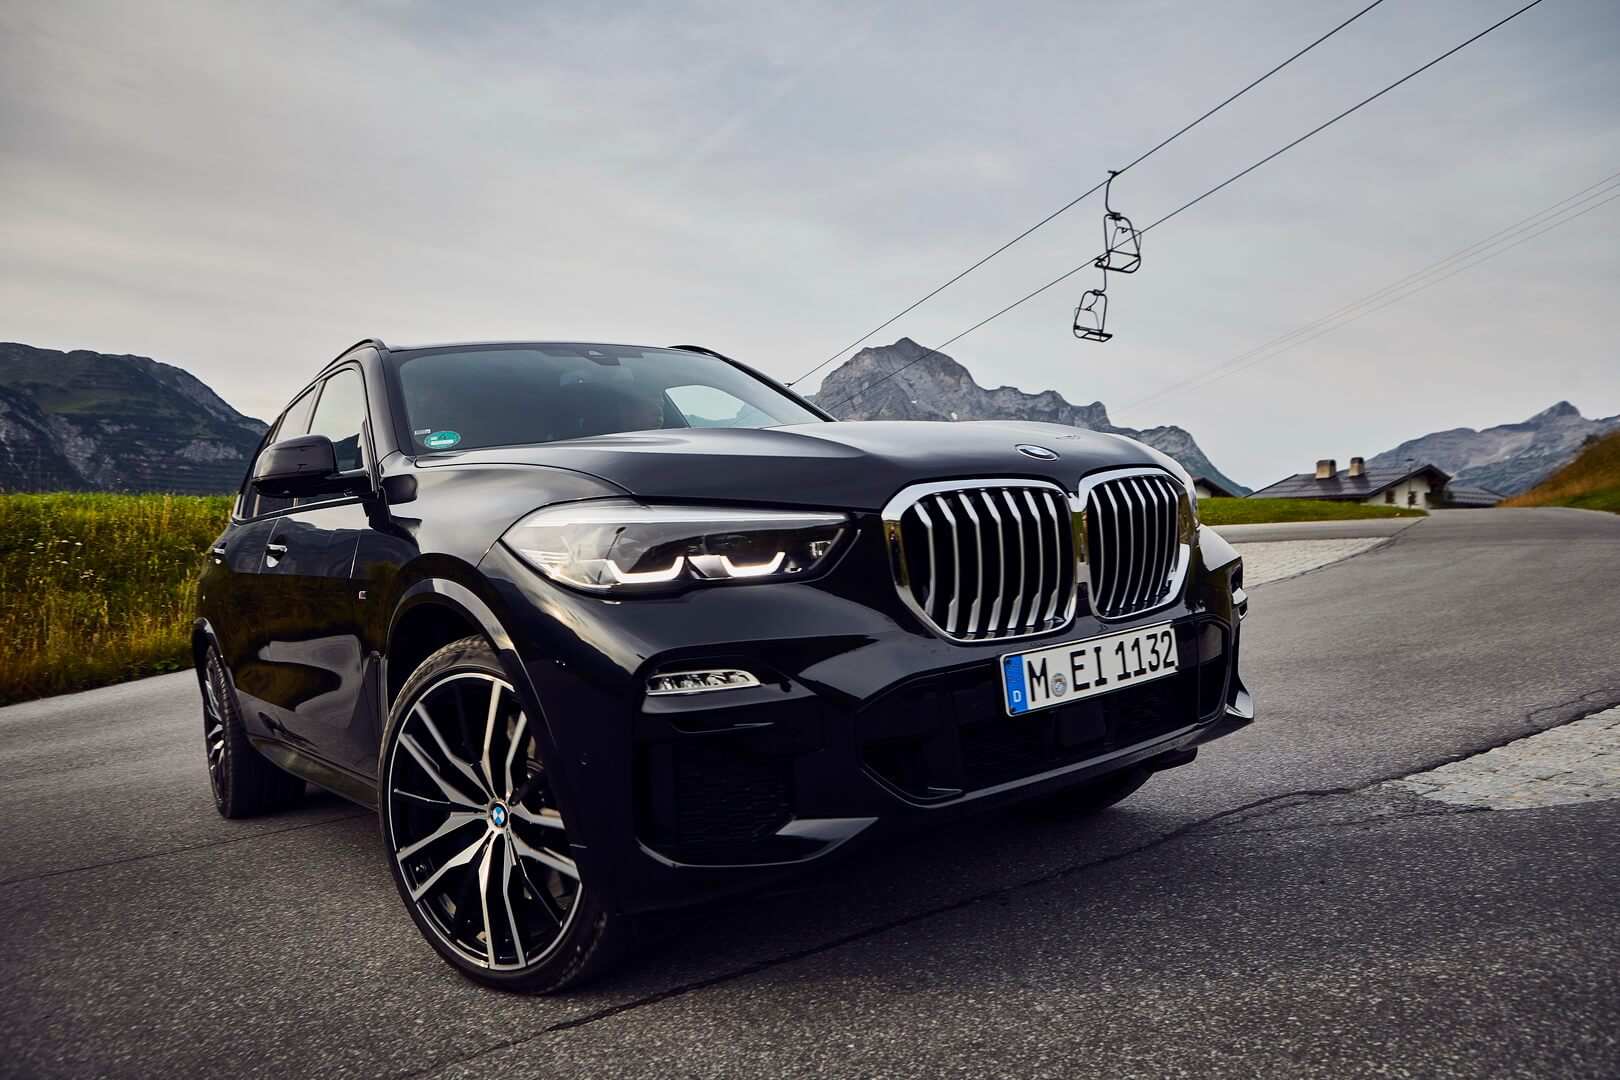 BMW X5 xDrive45e iPerformance PHEV